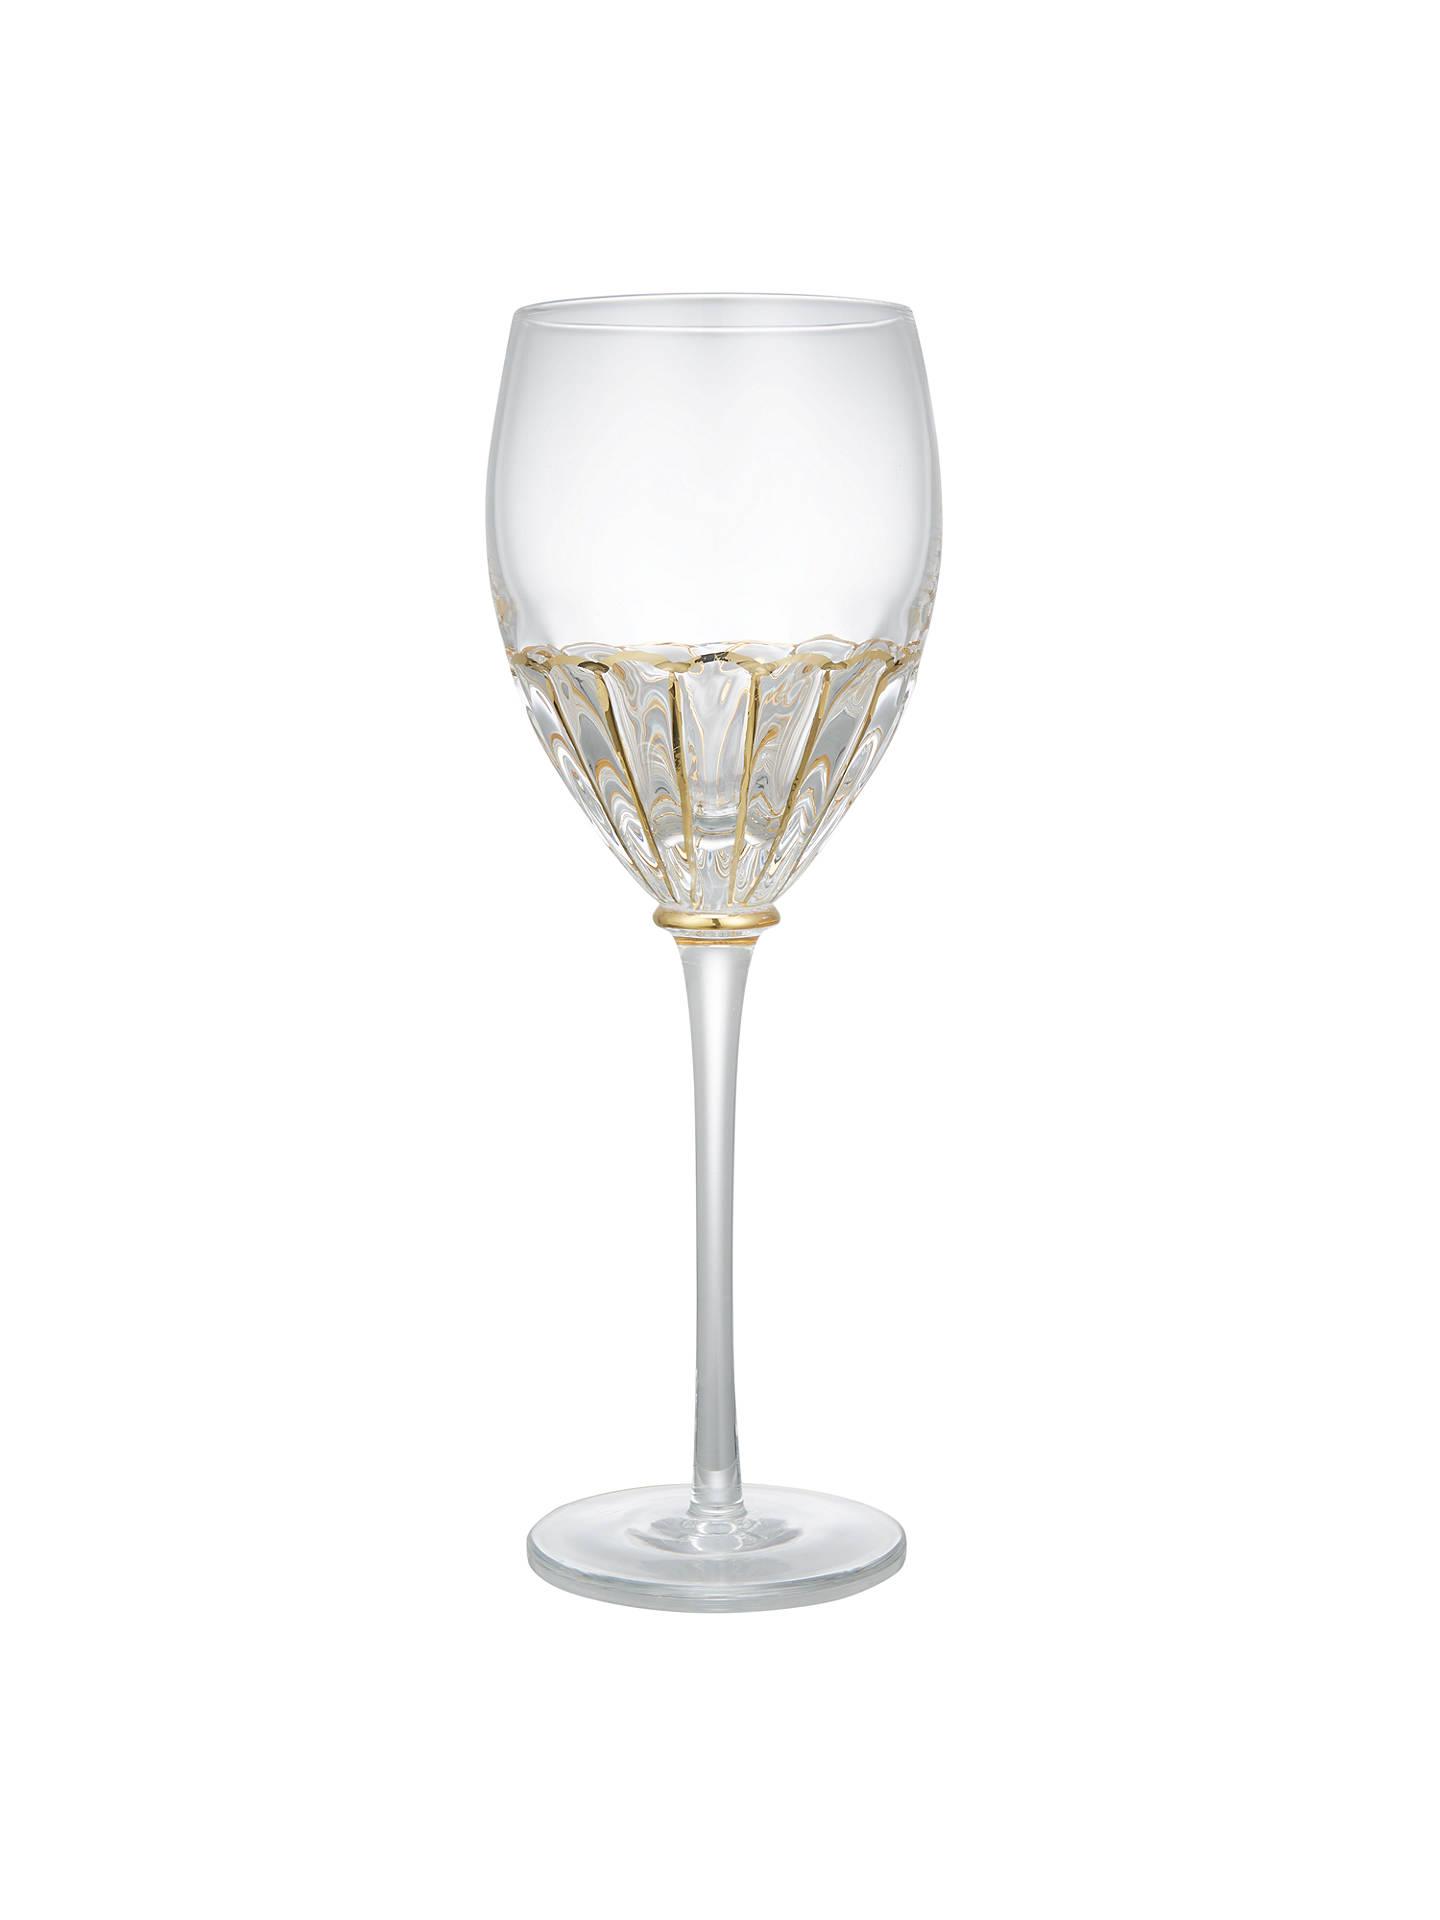 john lewis gold fan red wine glass 370ml at john lewis. Black Bedroom Furniture Sets. Home Design Ideas